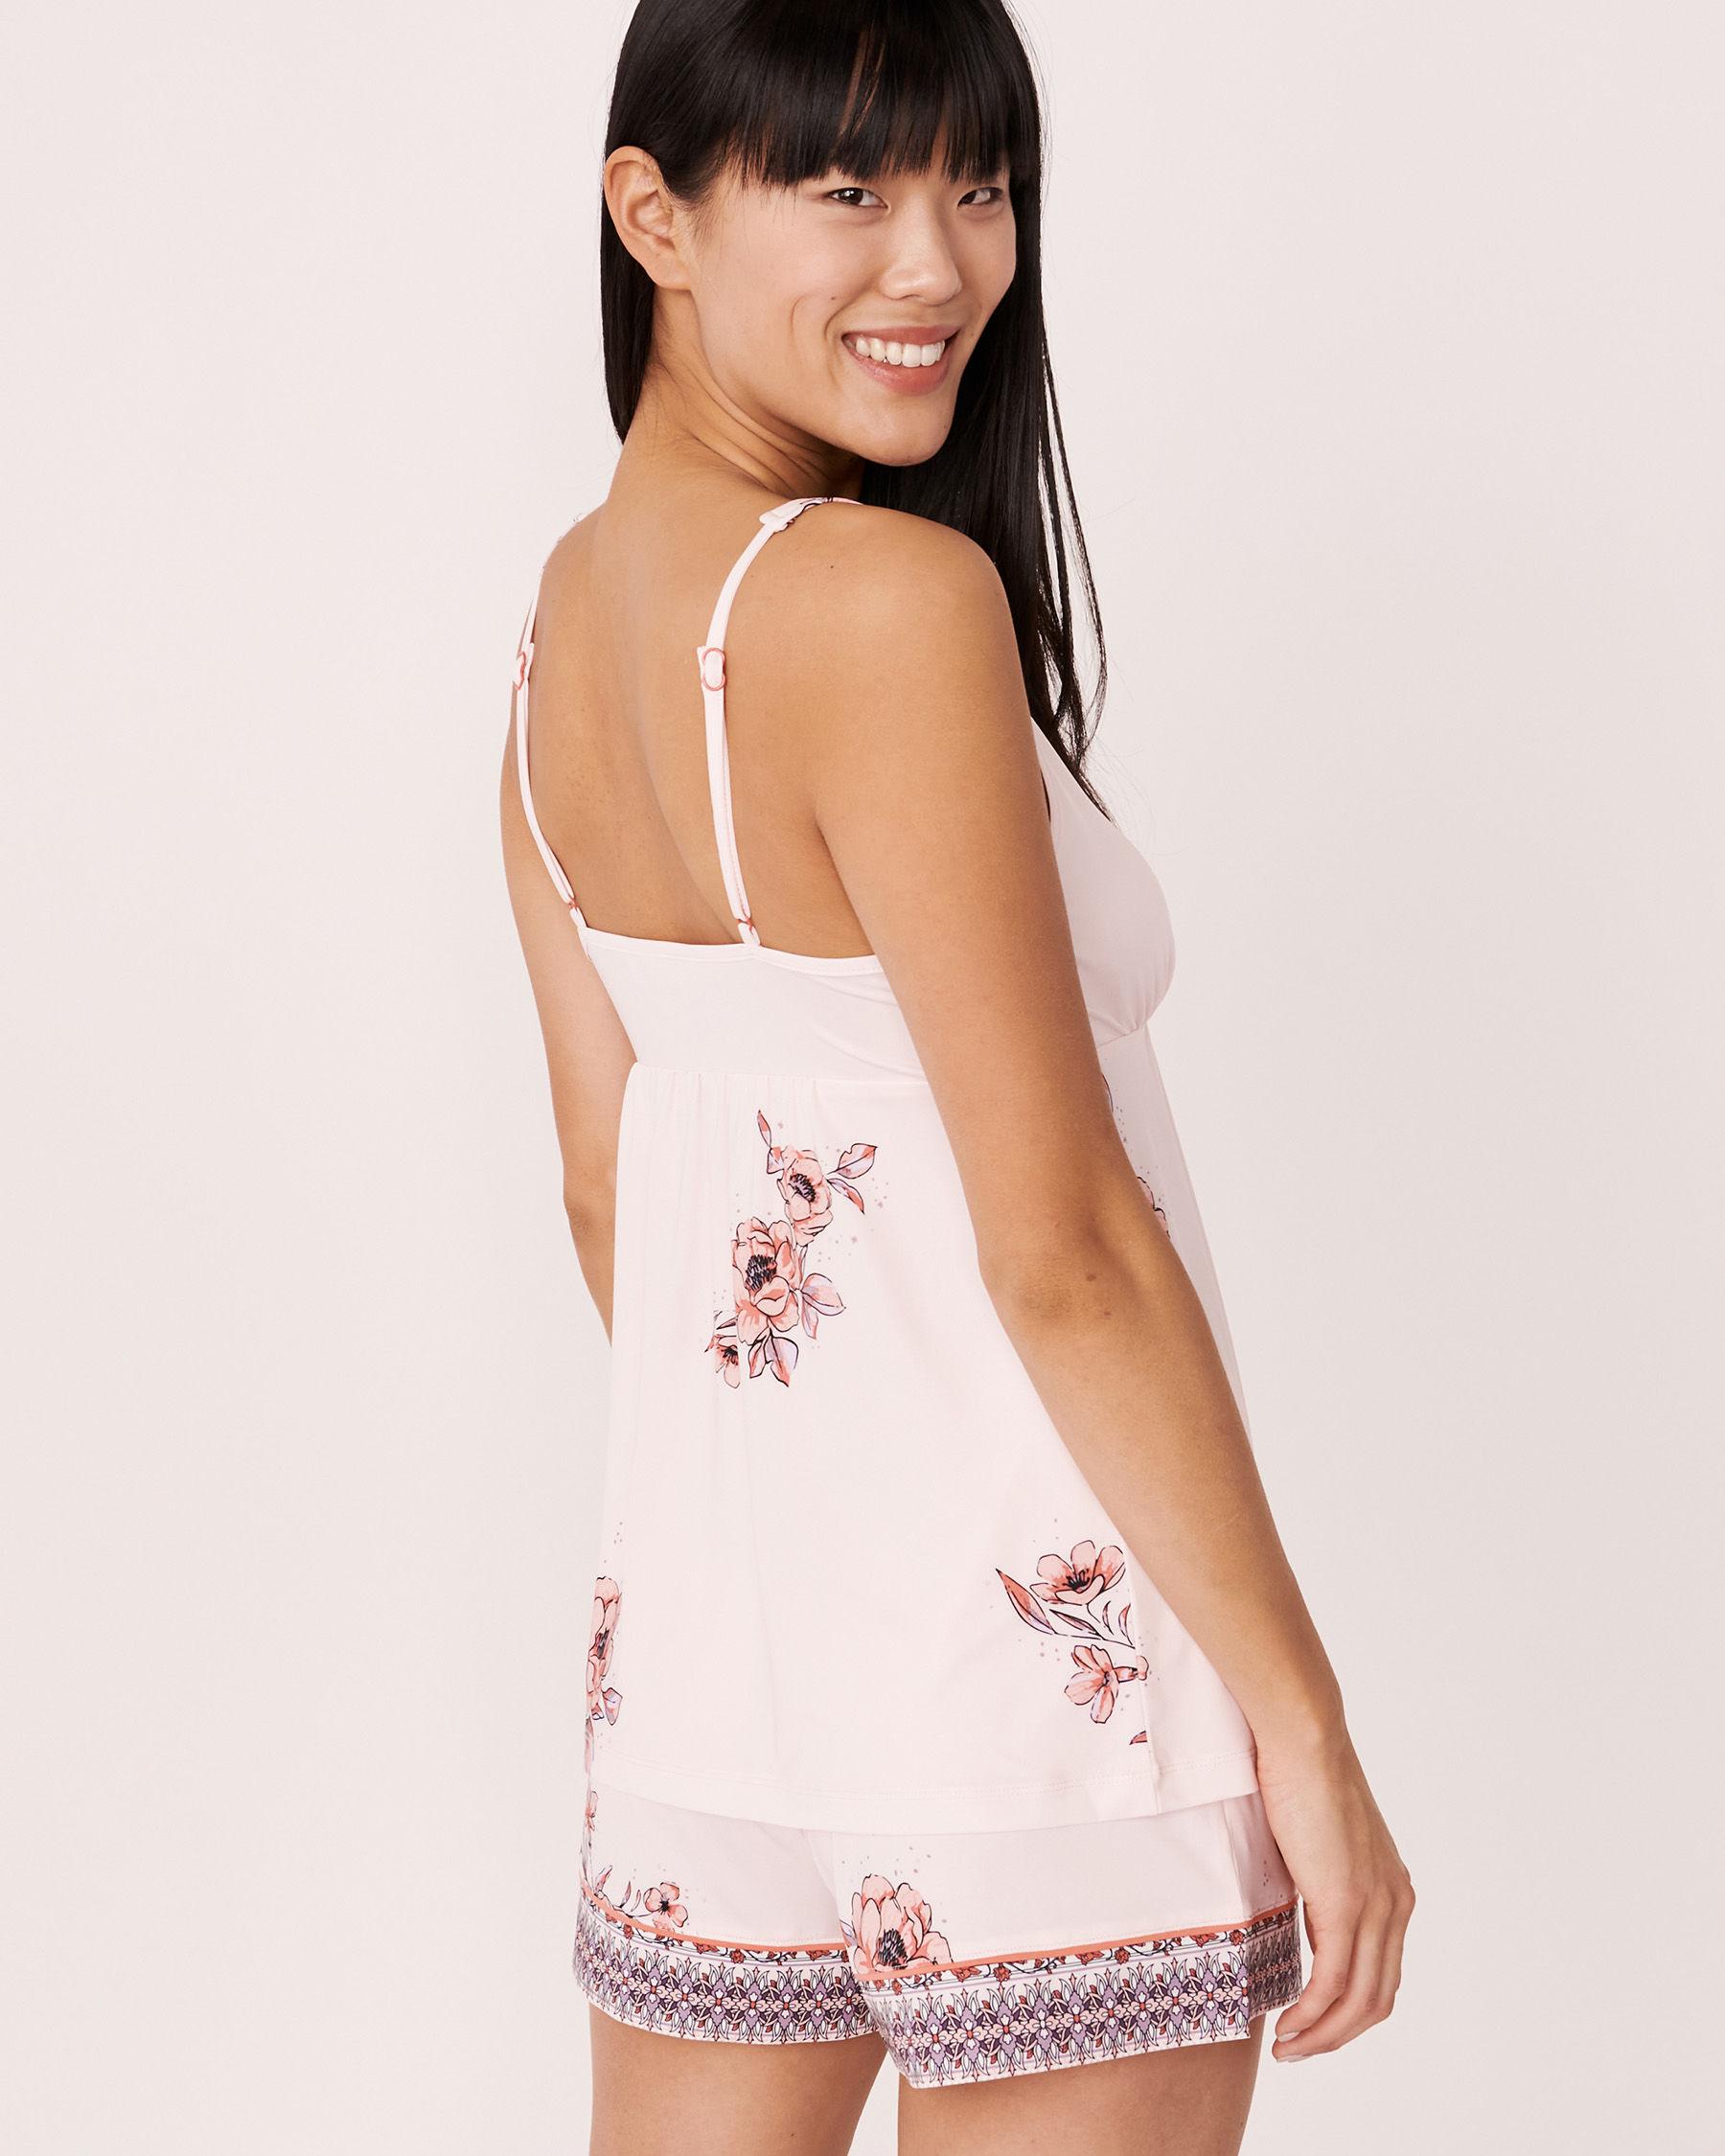 LA VIE EN ROSE Recycled Fibers Lace Trim Cami Floral print 40100059 - View2